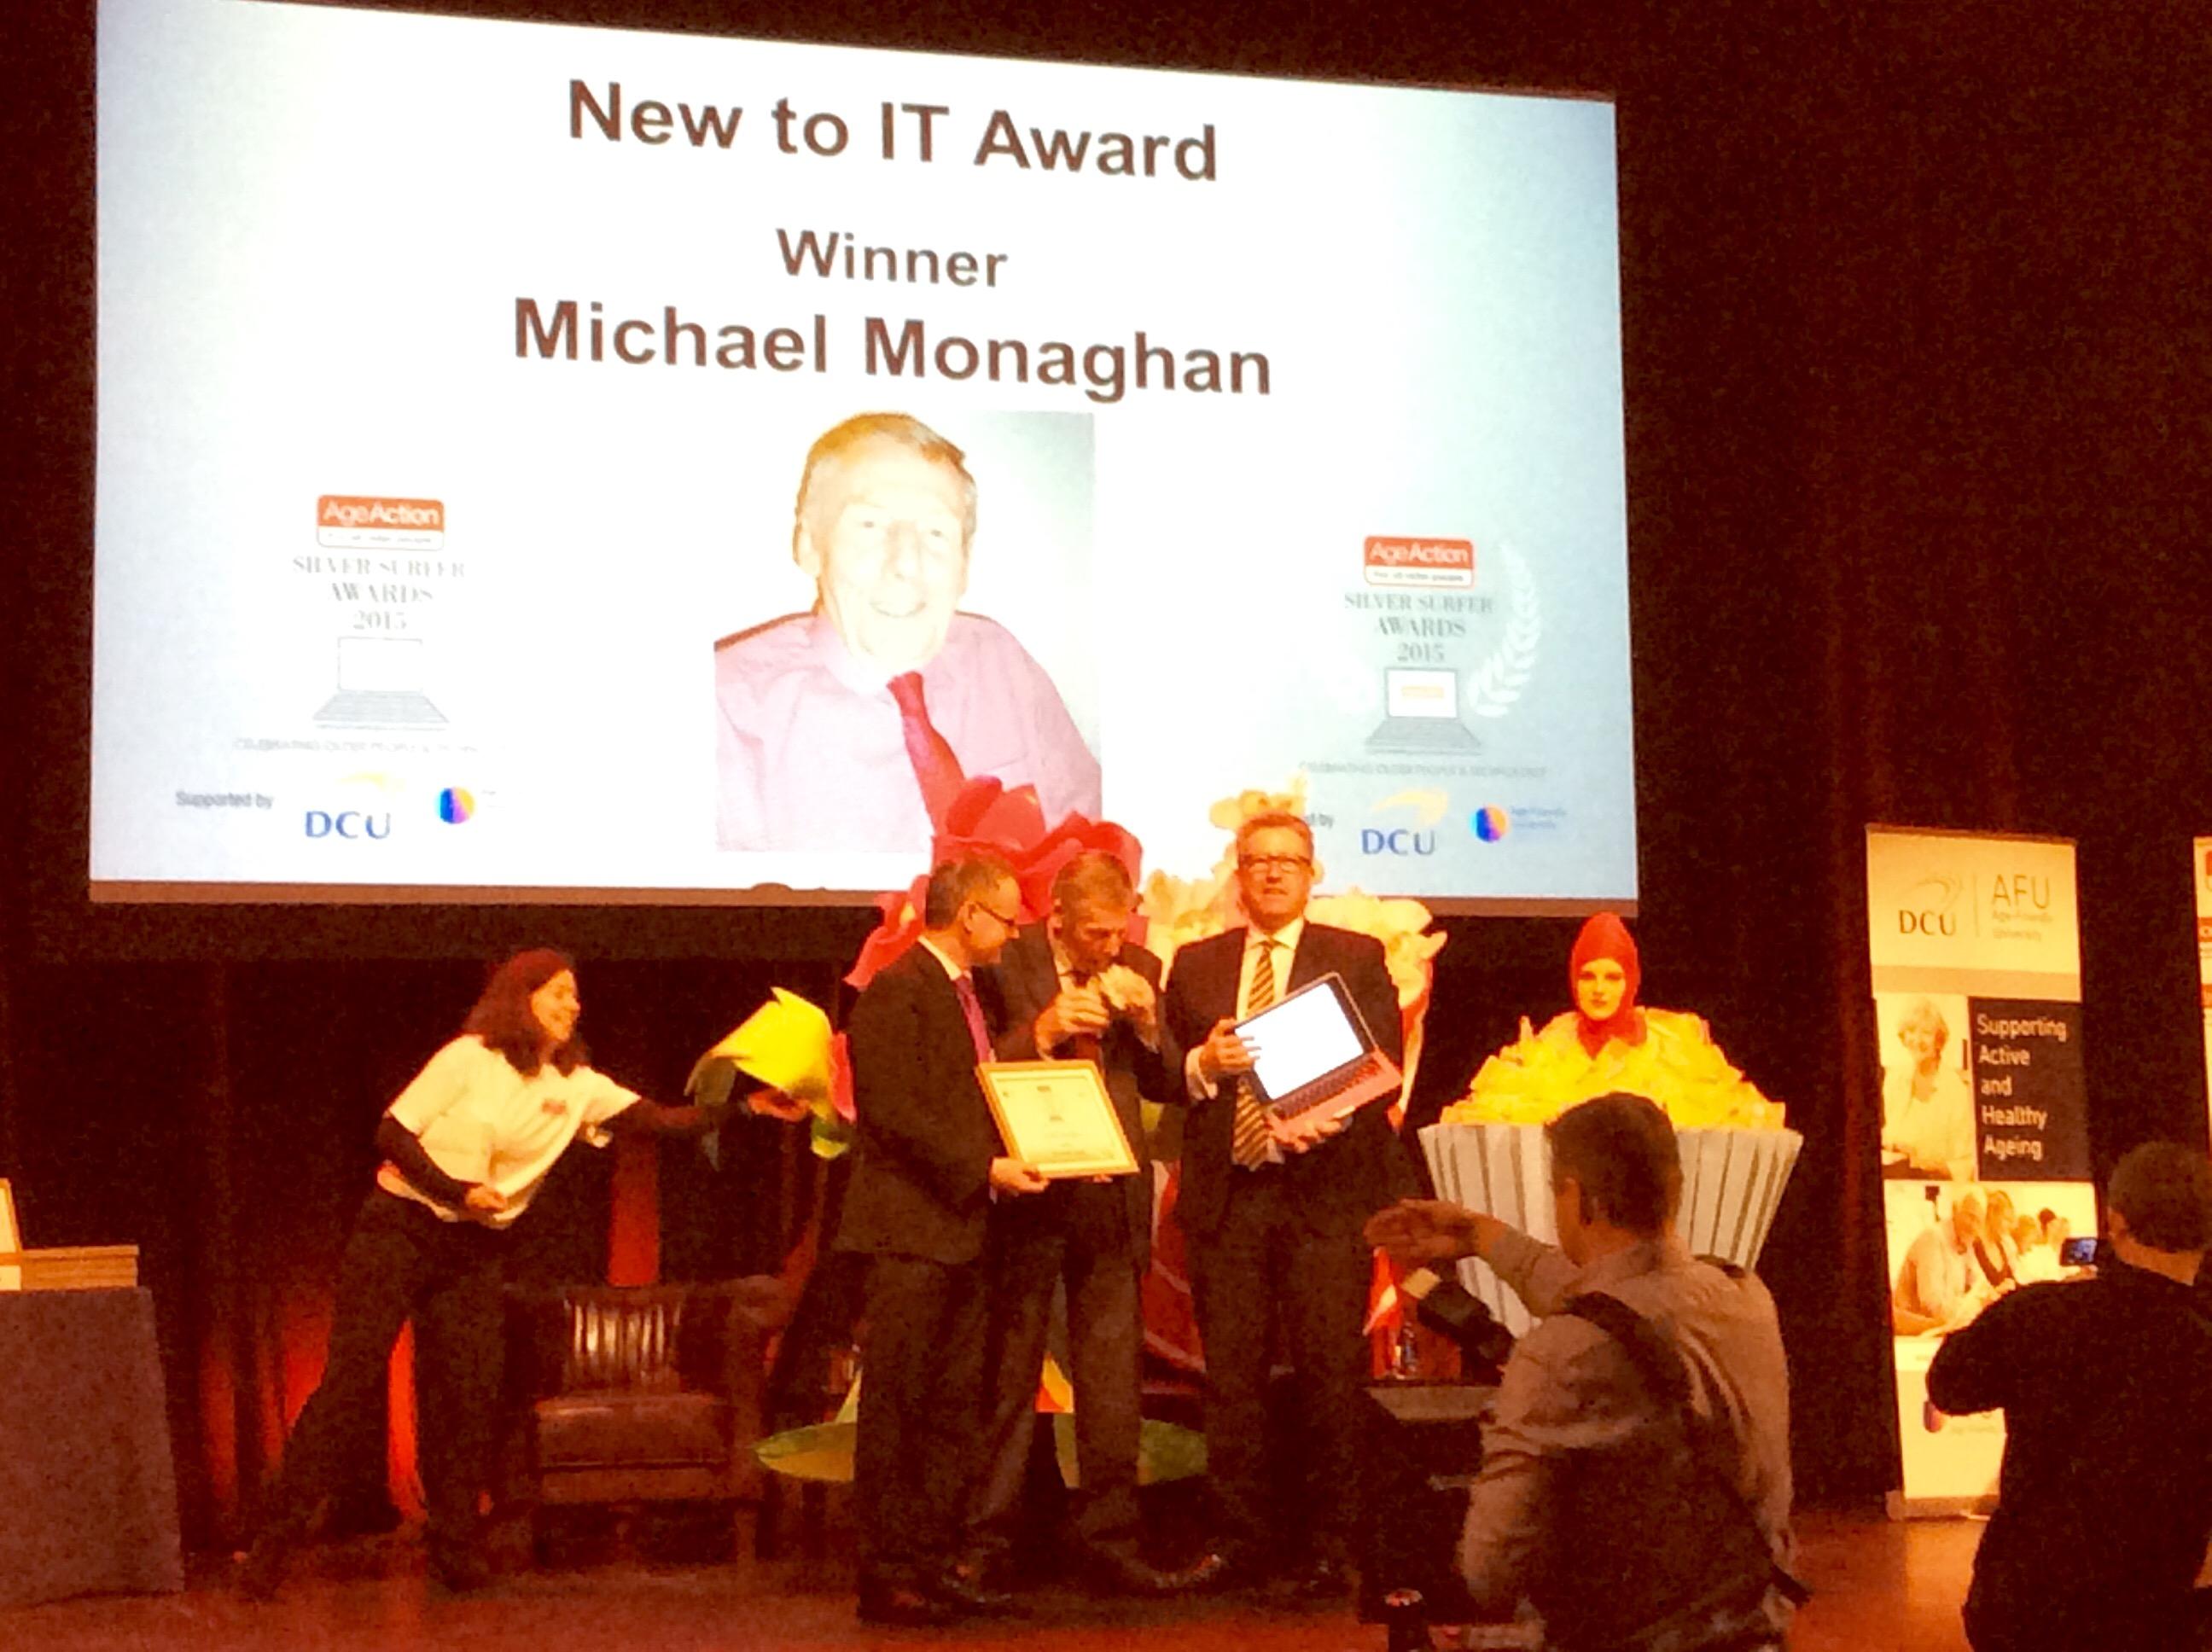 Michael Monaghan was the winner